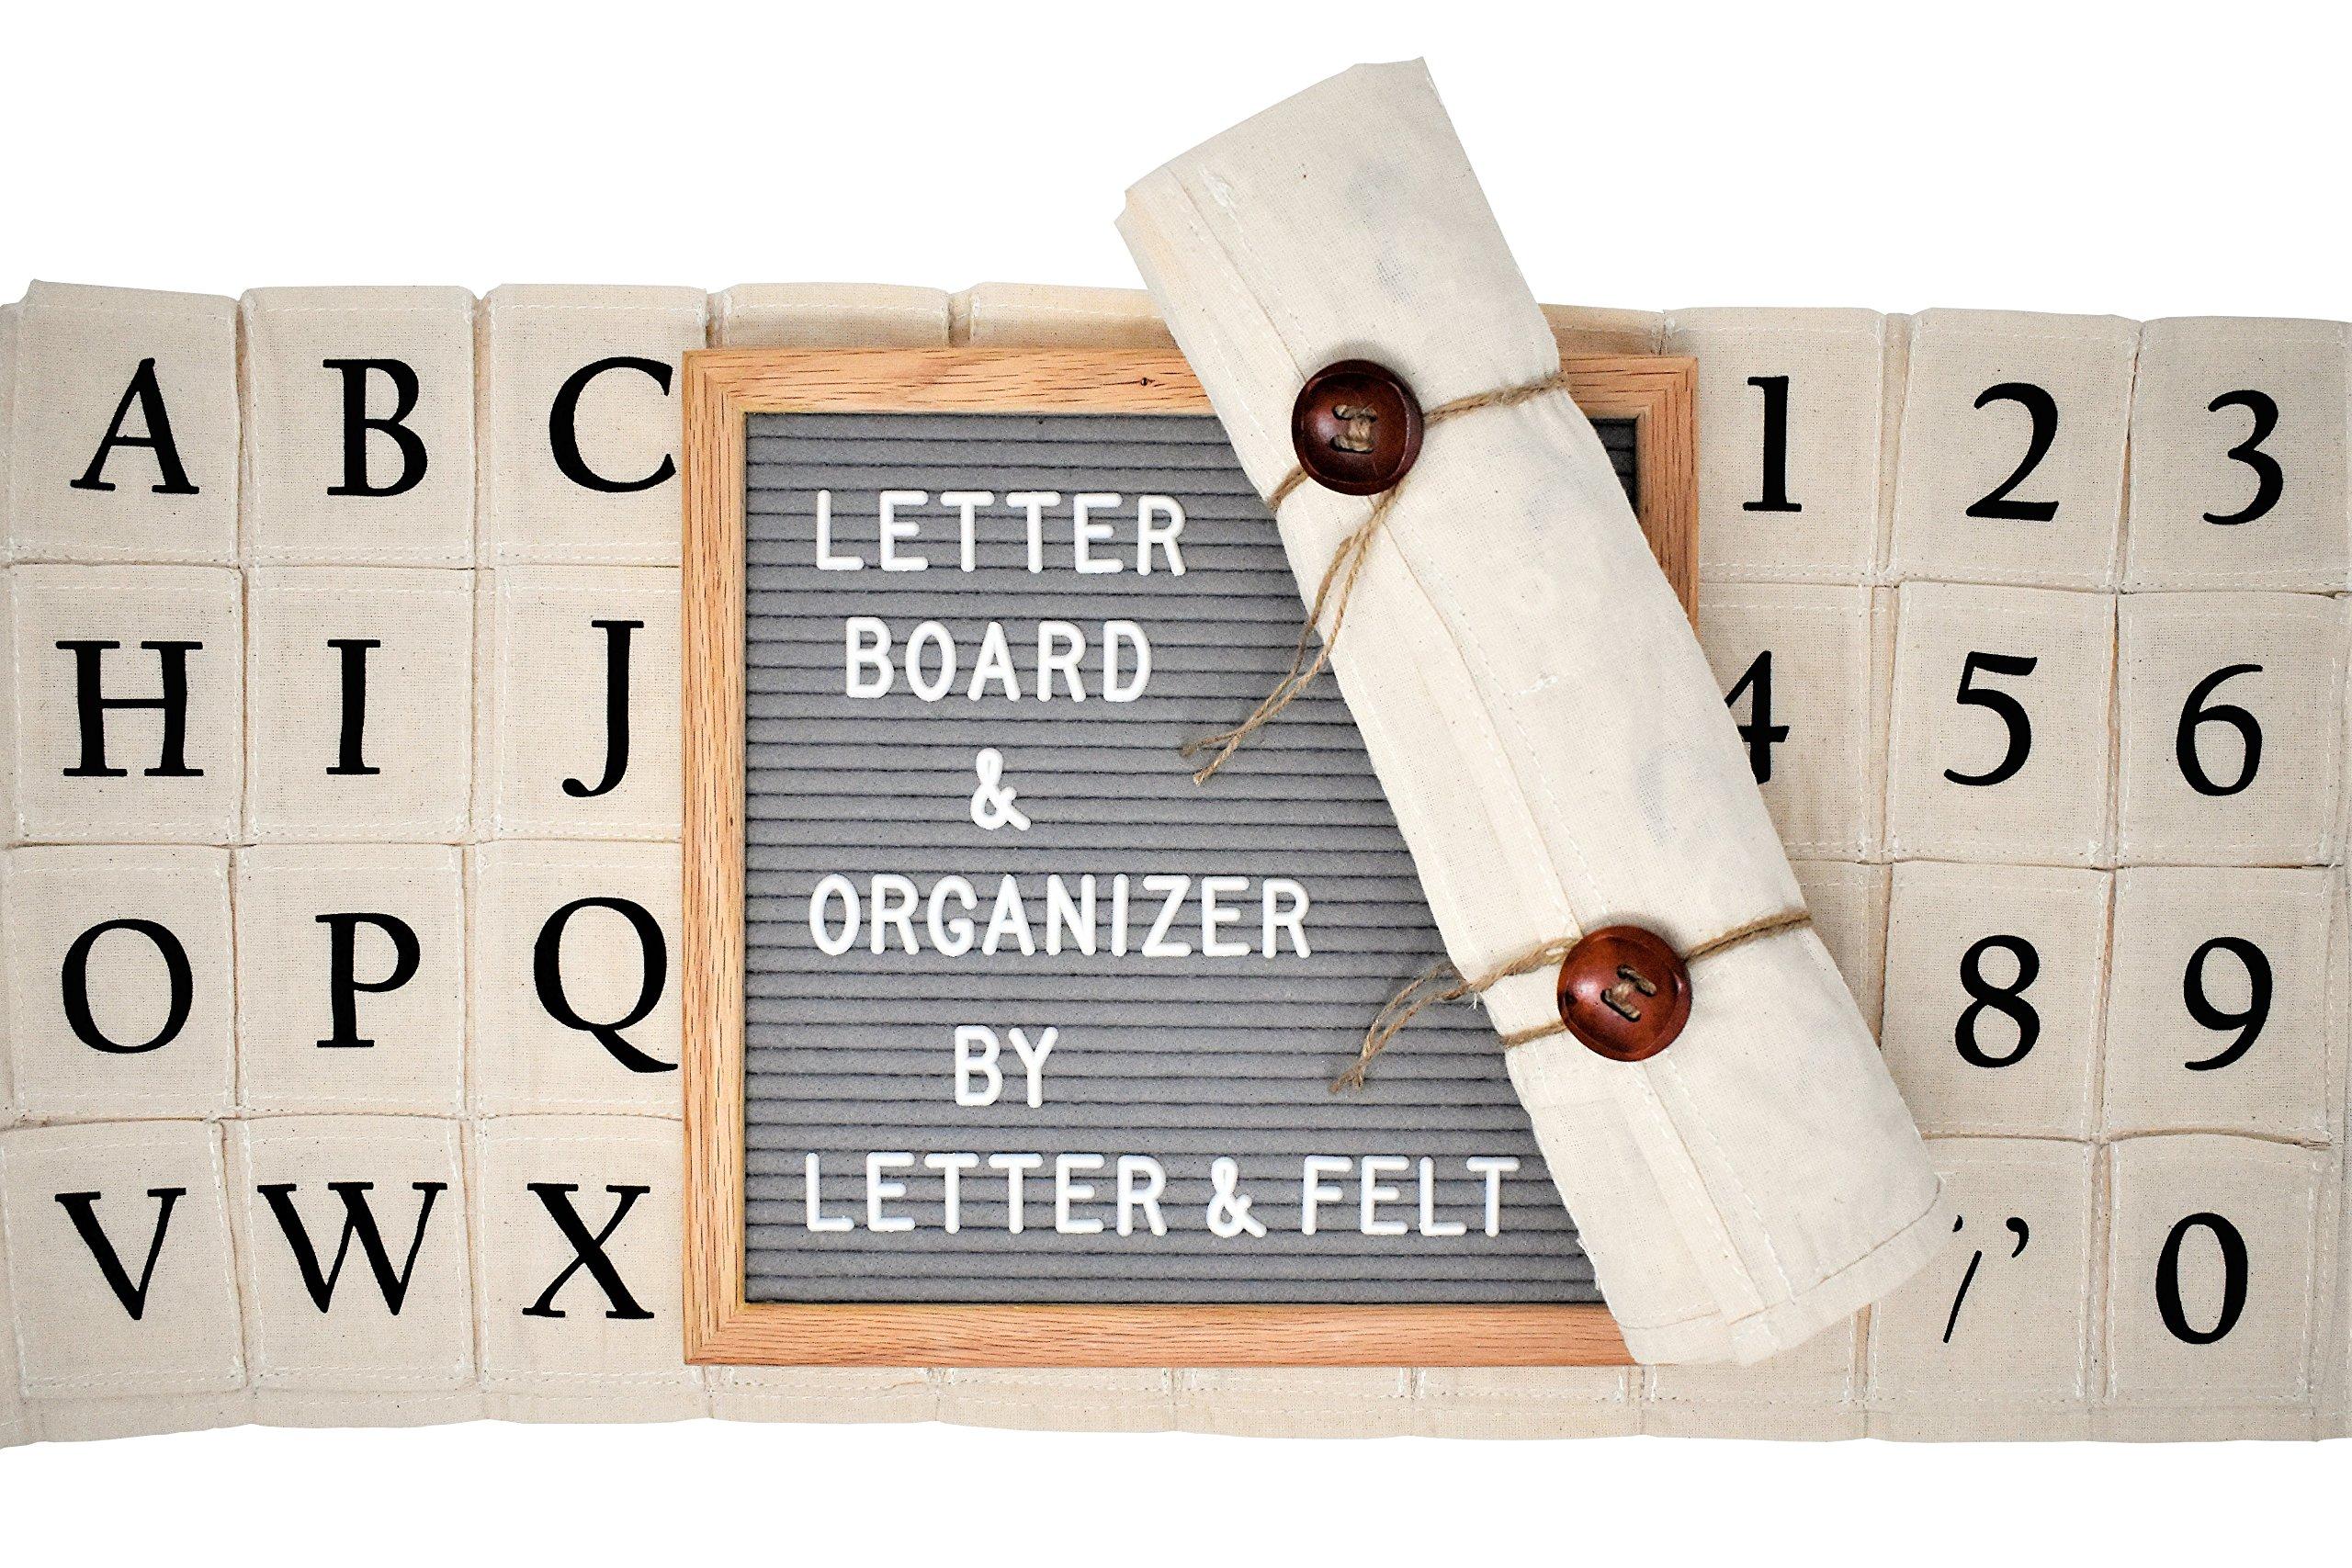 Premium 10x10 Letter Board with Letter Organizer - Changeable Gray Felt Vintage Letter Board Sign by Letter&Felt